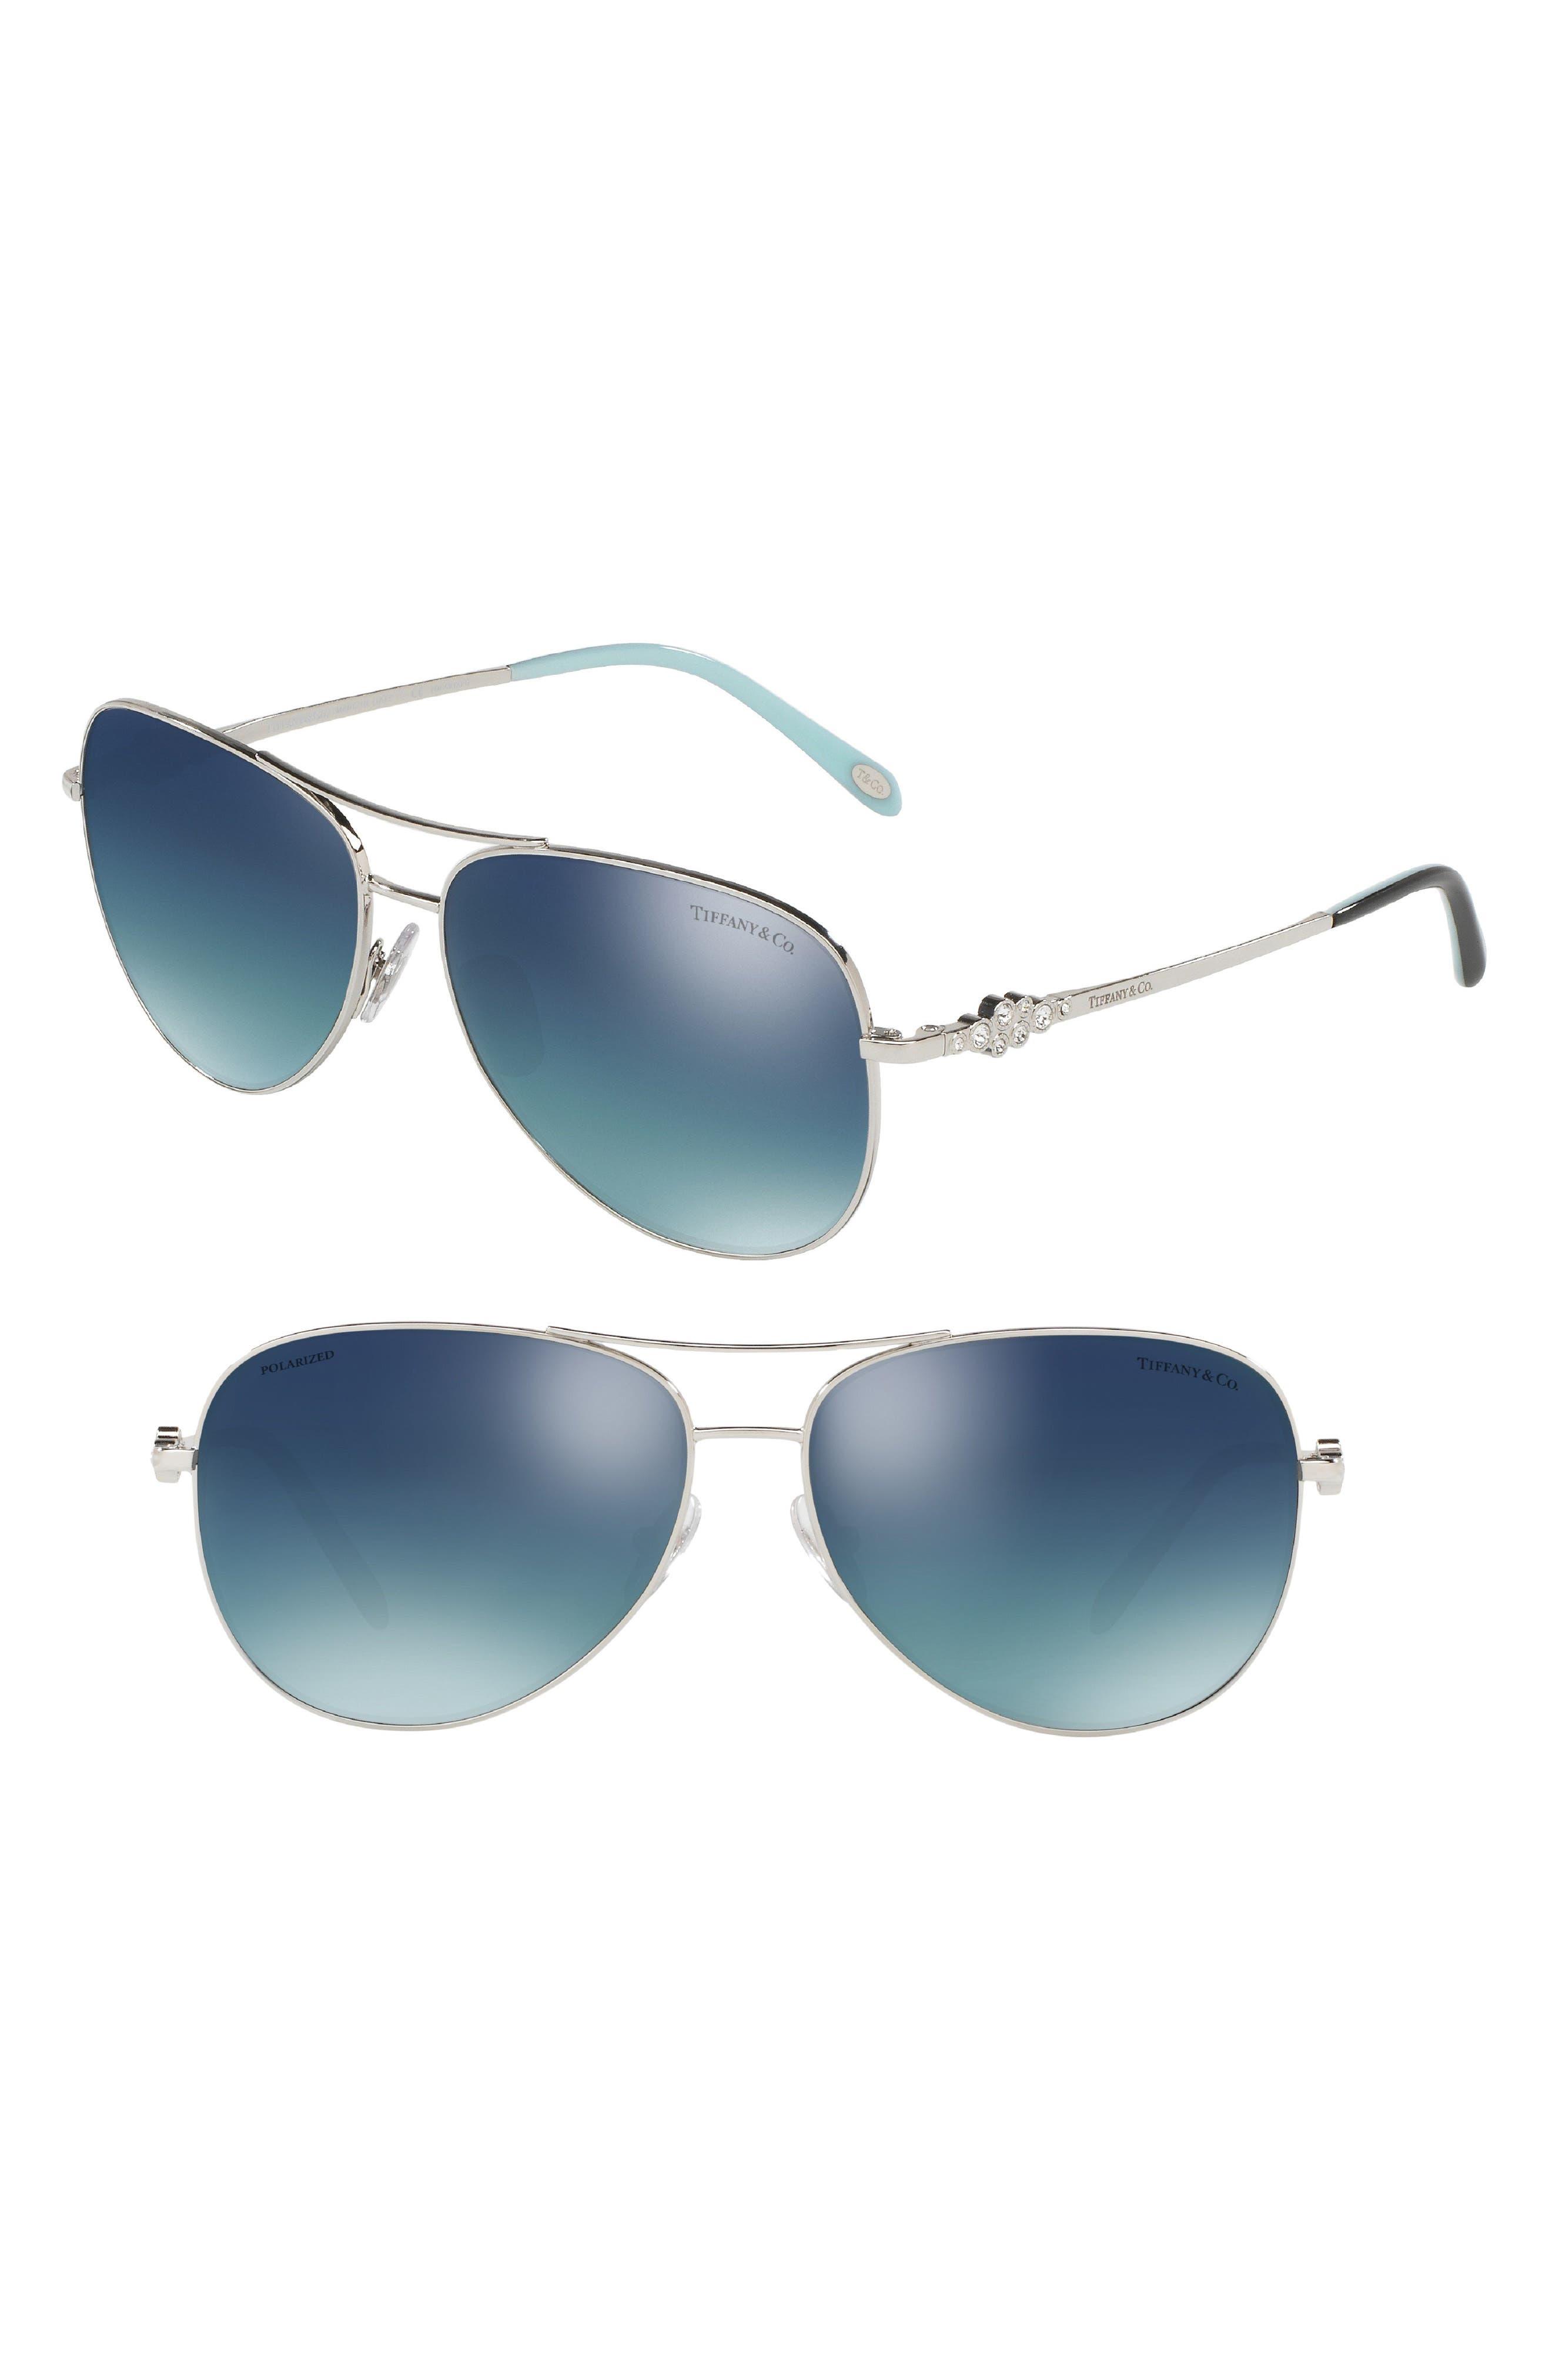 Tiffany 59mm Polarized Metal Aviator Sunglasses,                             Main thumbnail 1, color,                             SILVER GRADIENT MIRROR